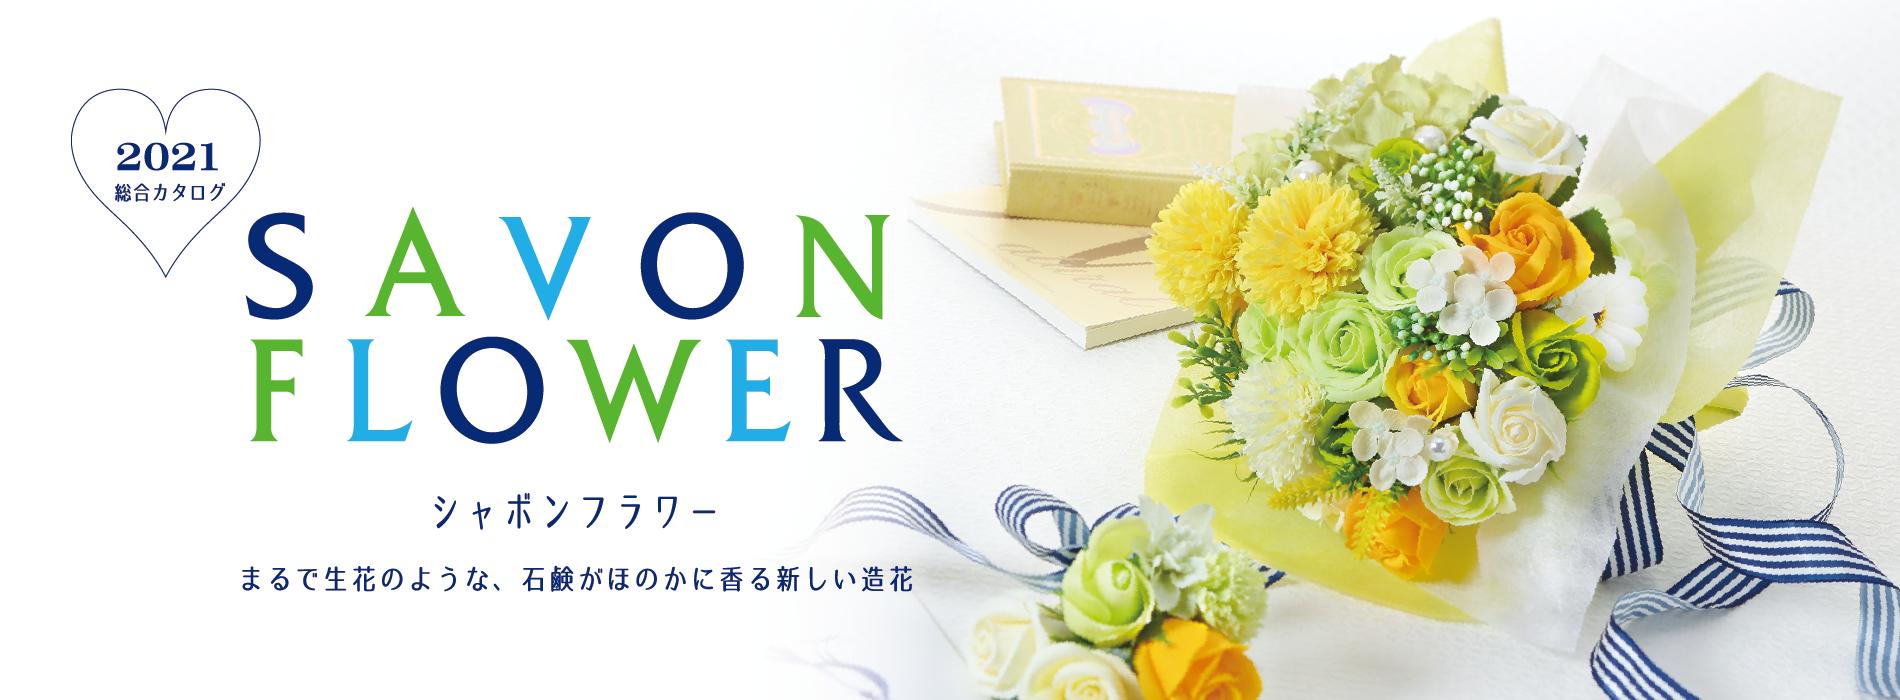 SAVON FLOWER 総合カタログ2021